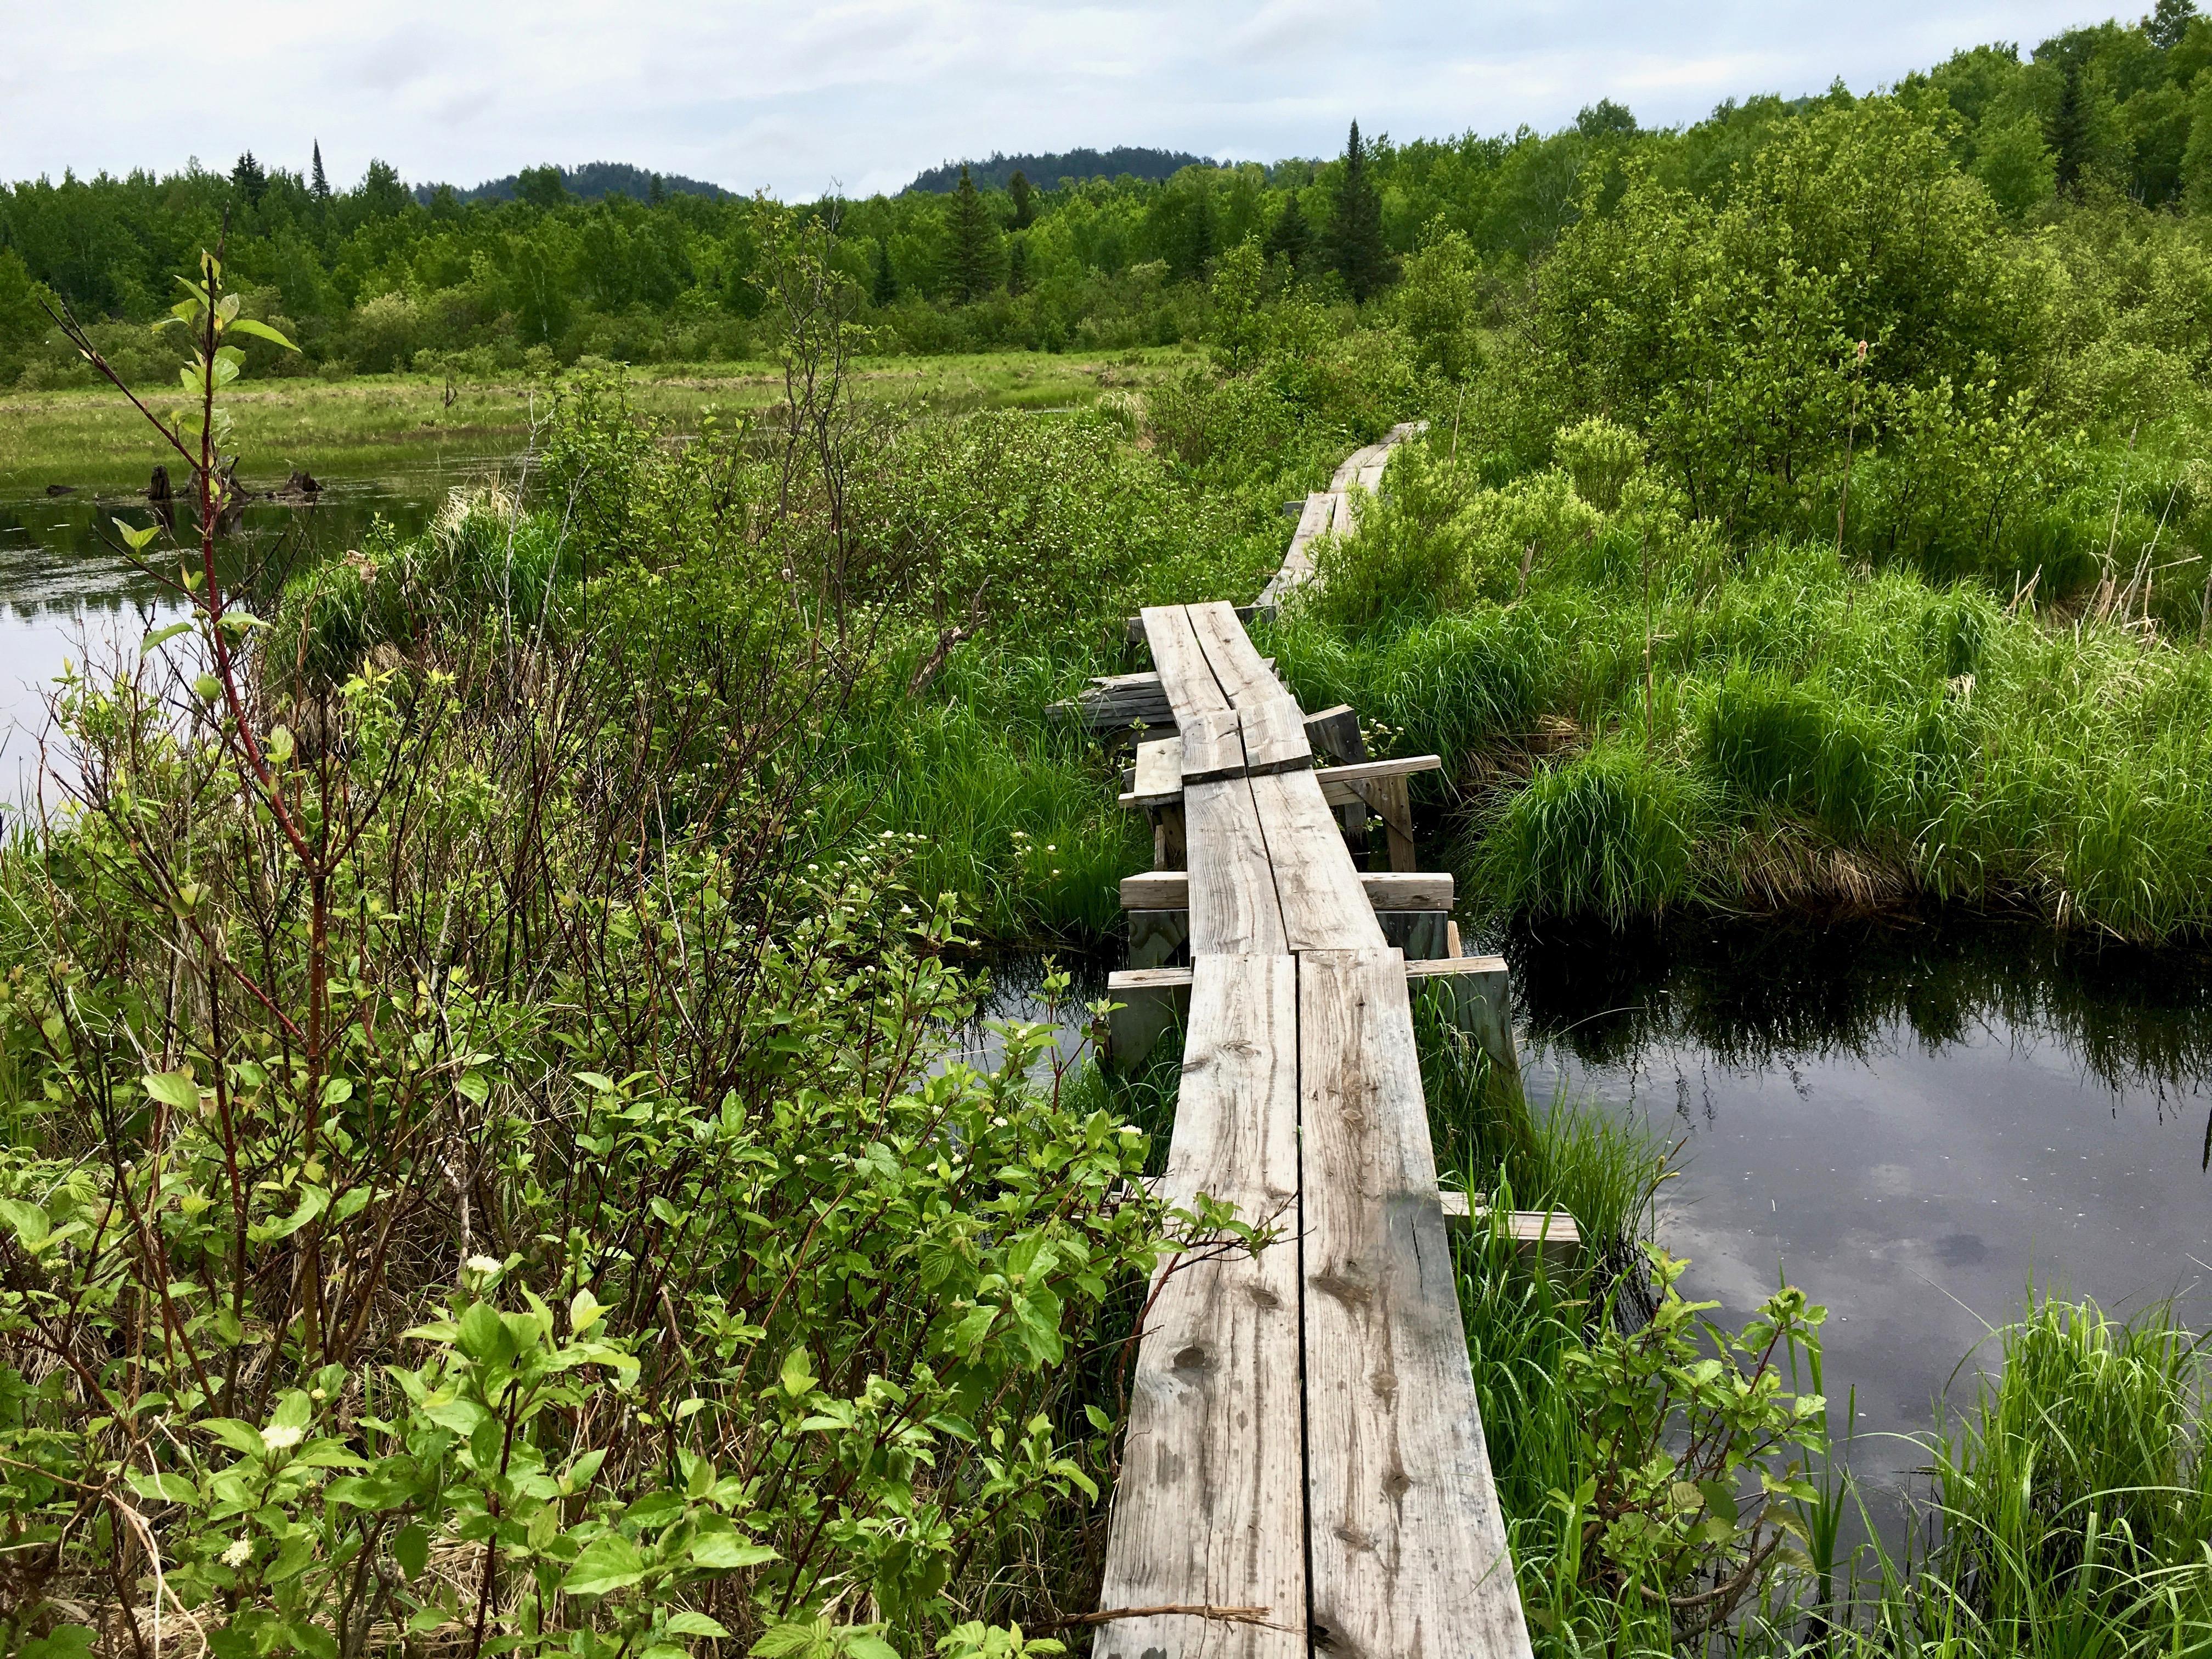 Superior Hiking Trail 25